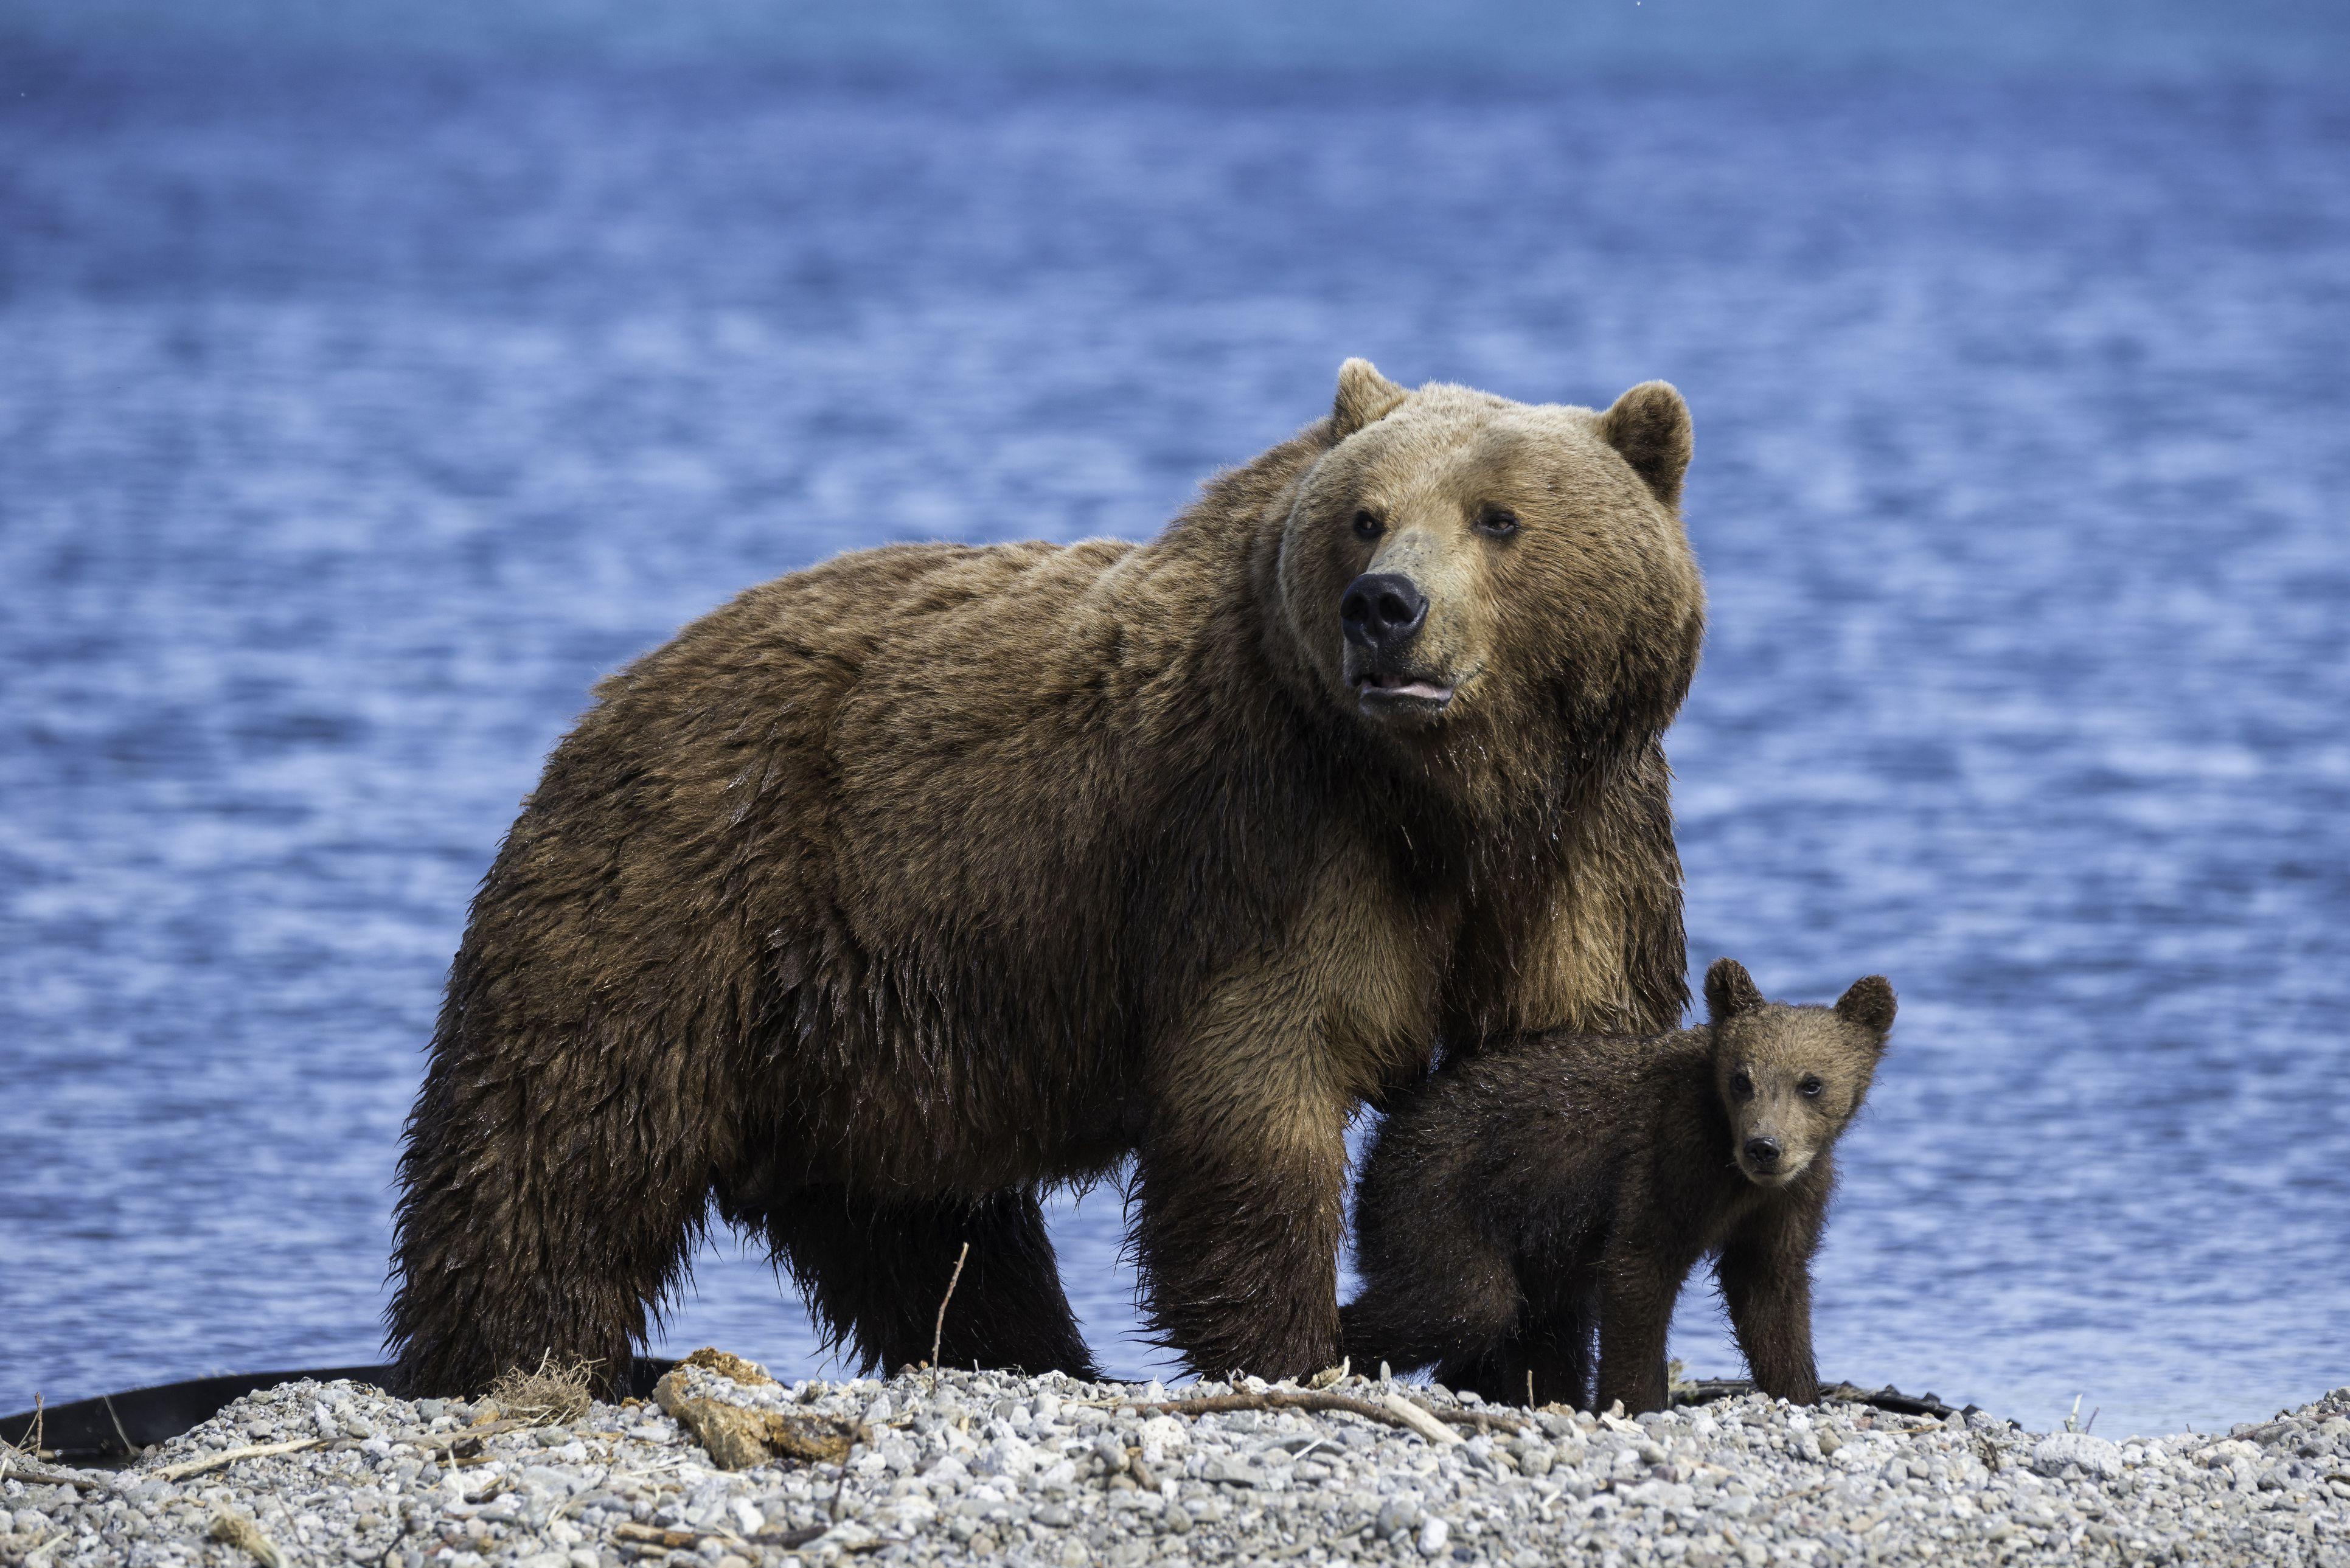 Brown Bear Facts: Behavior, Diet, Habitat, and More